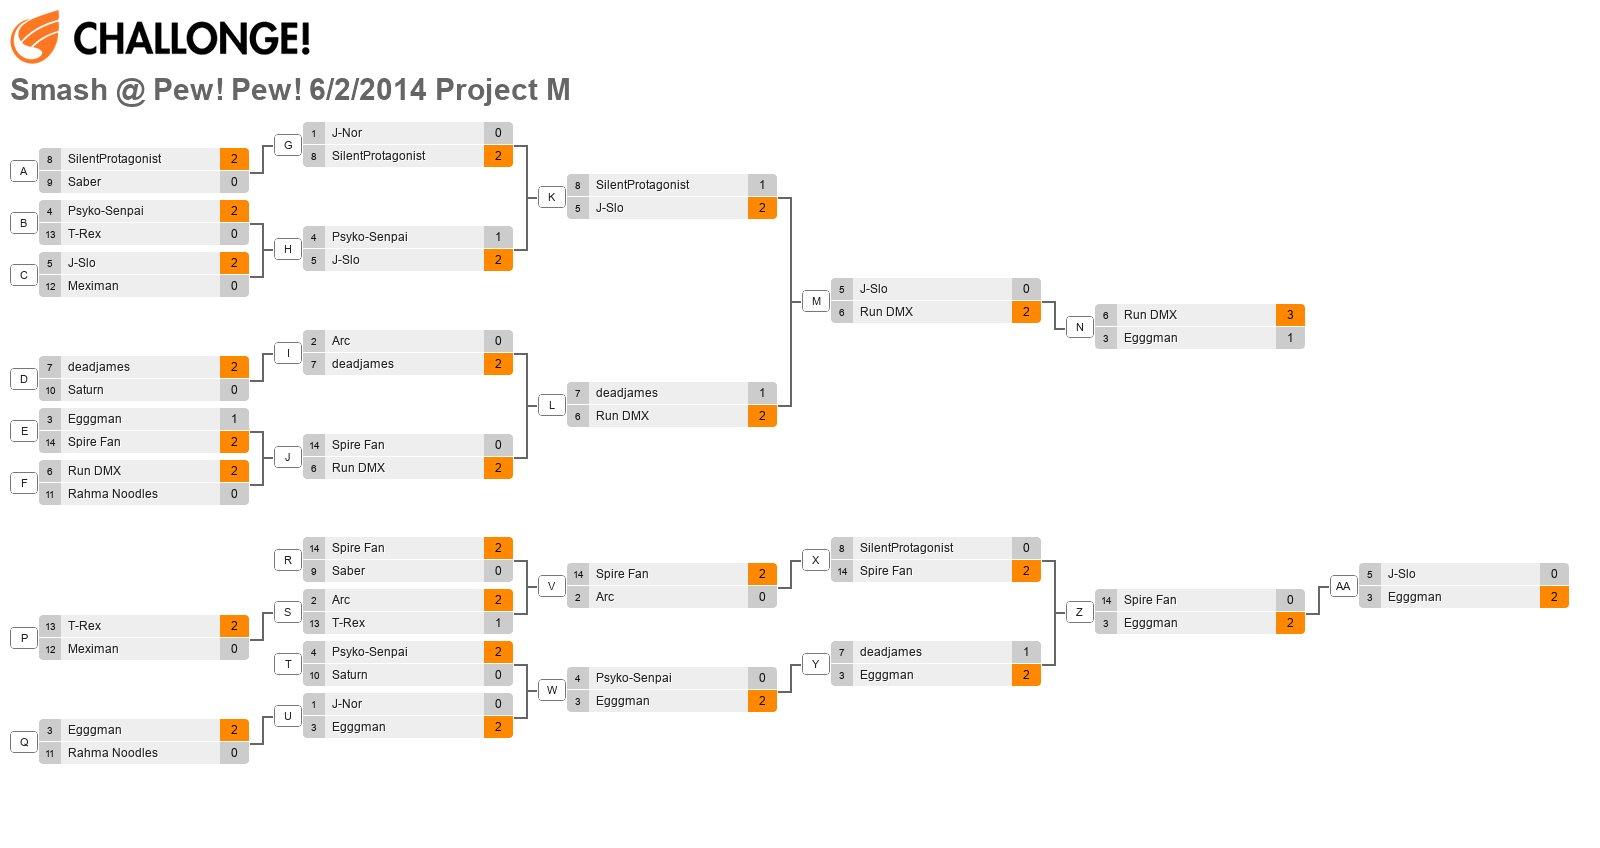 Smash @ Pew! Pew! 6/2/2014 Project M